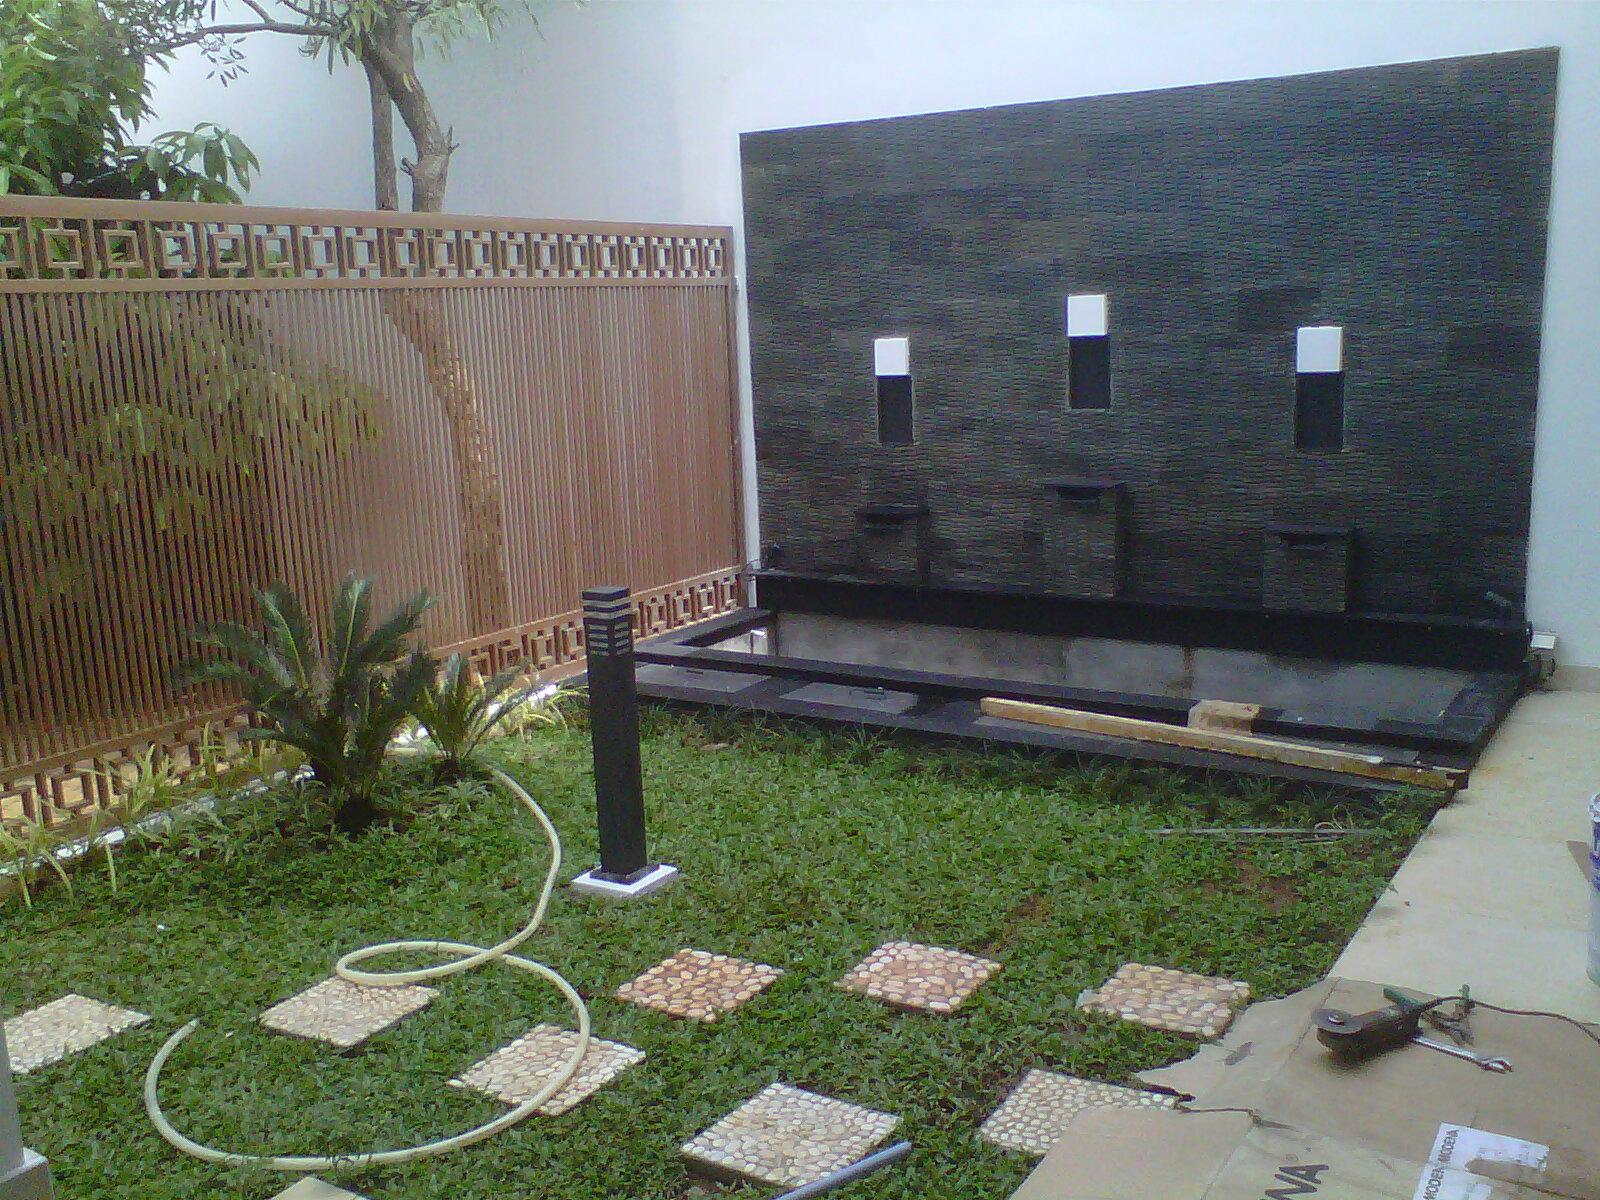 Kolam Minimalis Kolam Air Mancur Kolam Relief Tukang